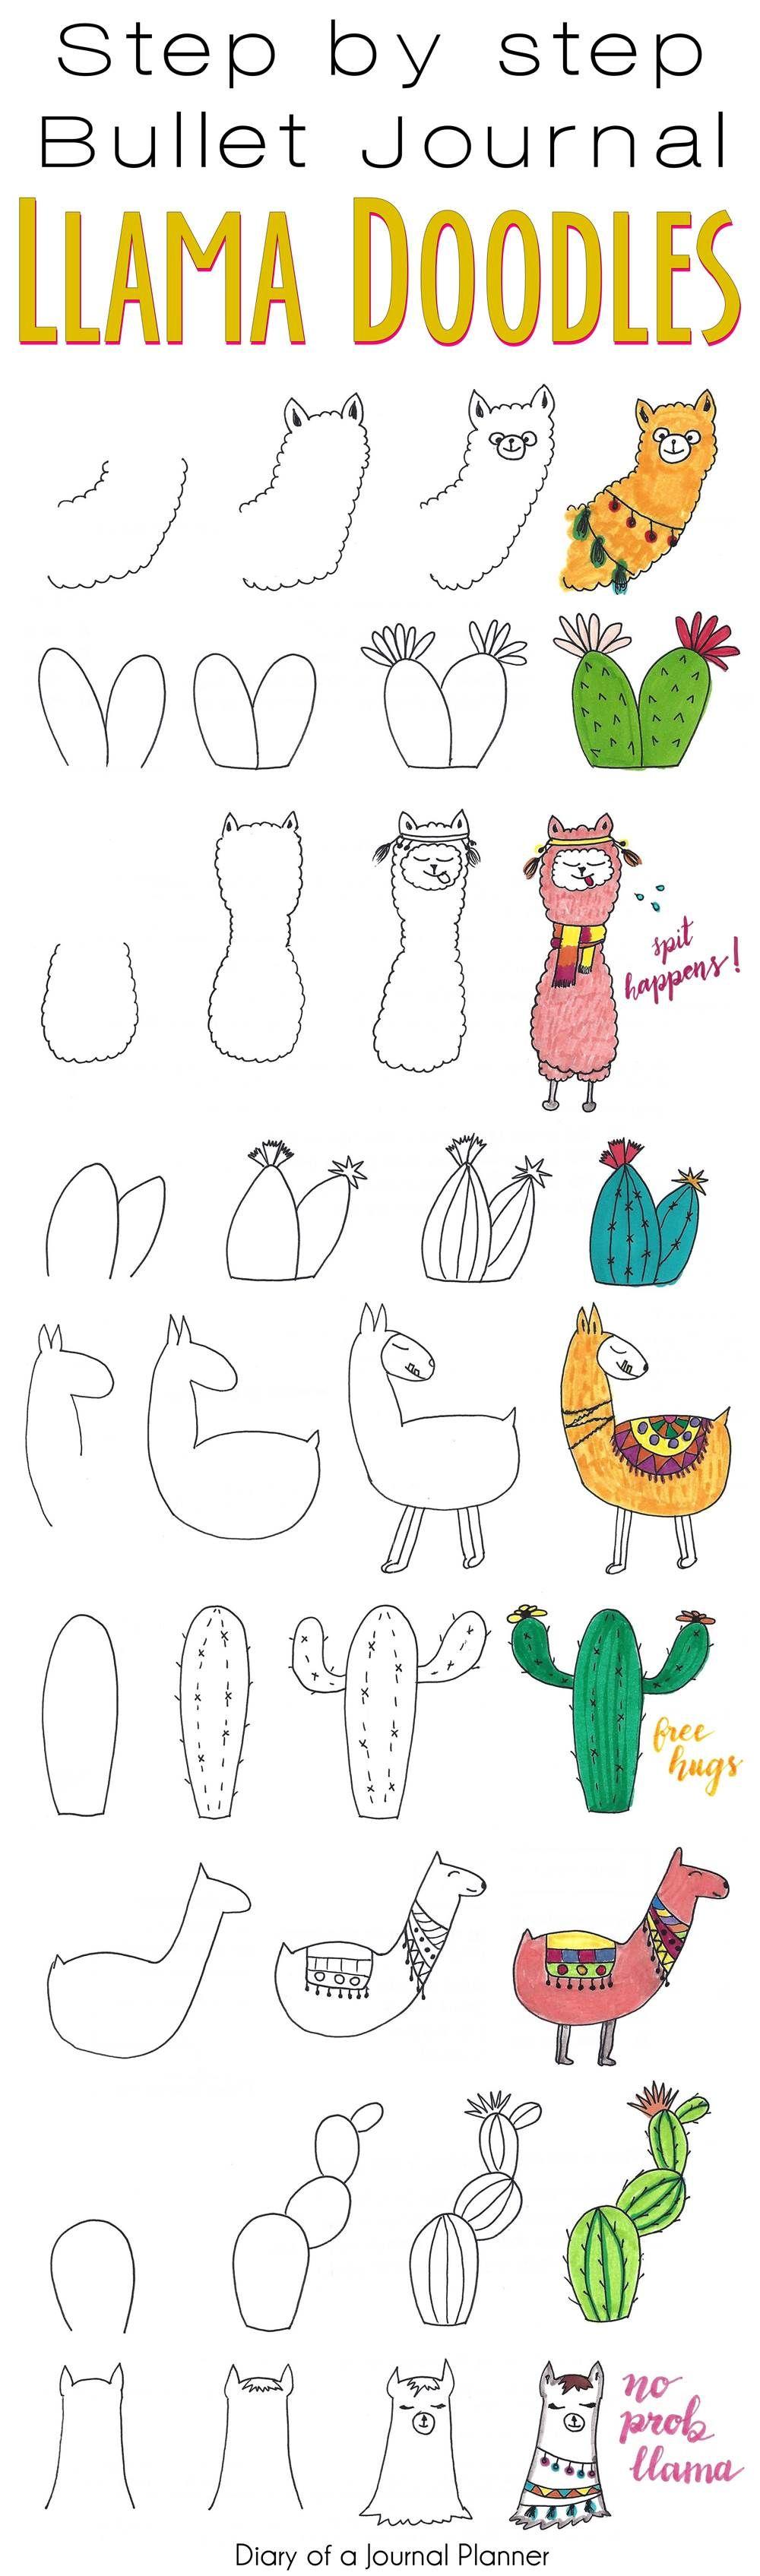 Llama doodles. Step by step tutorial for your bullet journal or planner #doodles #bulletjournal #bujo #doodles